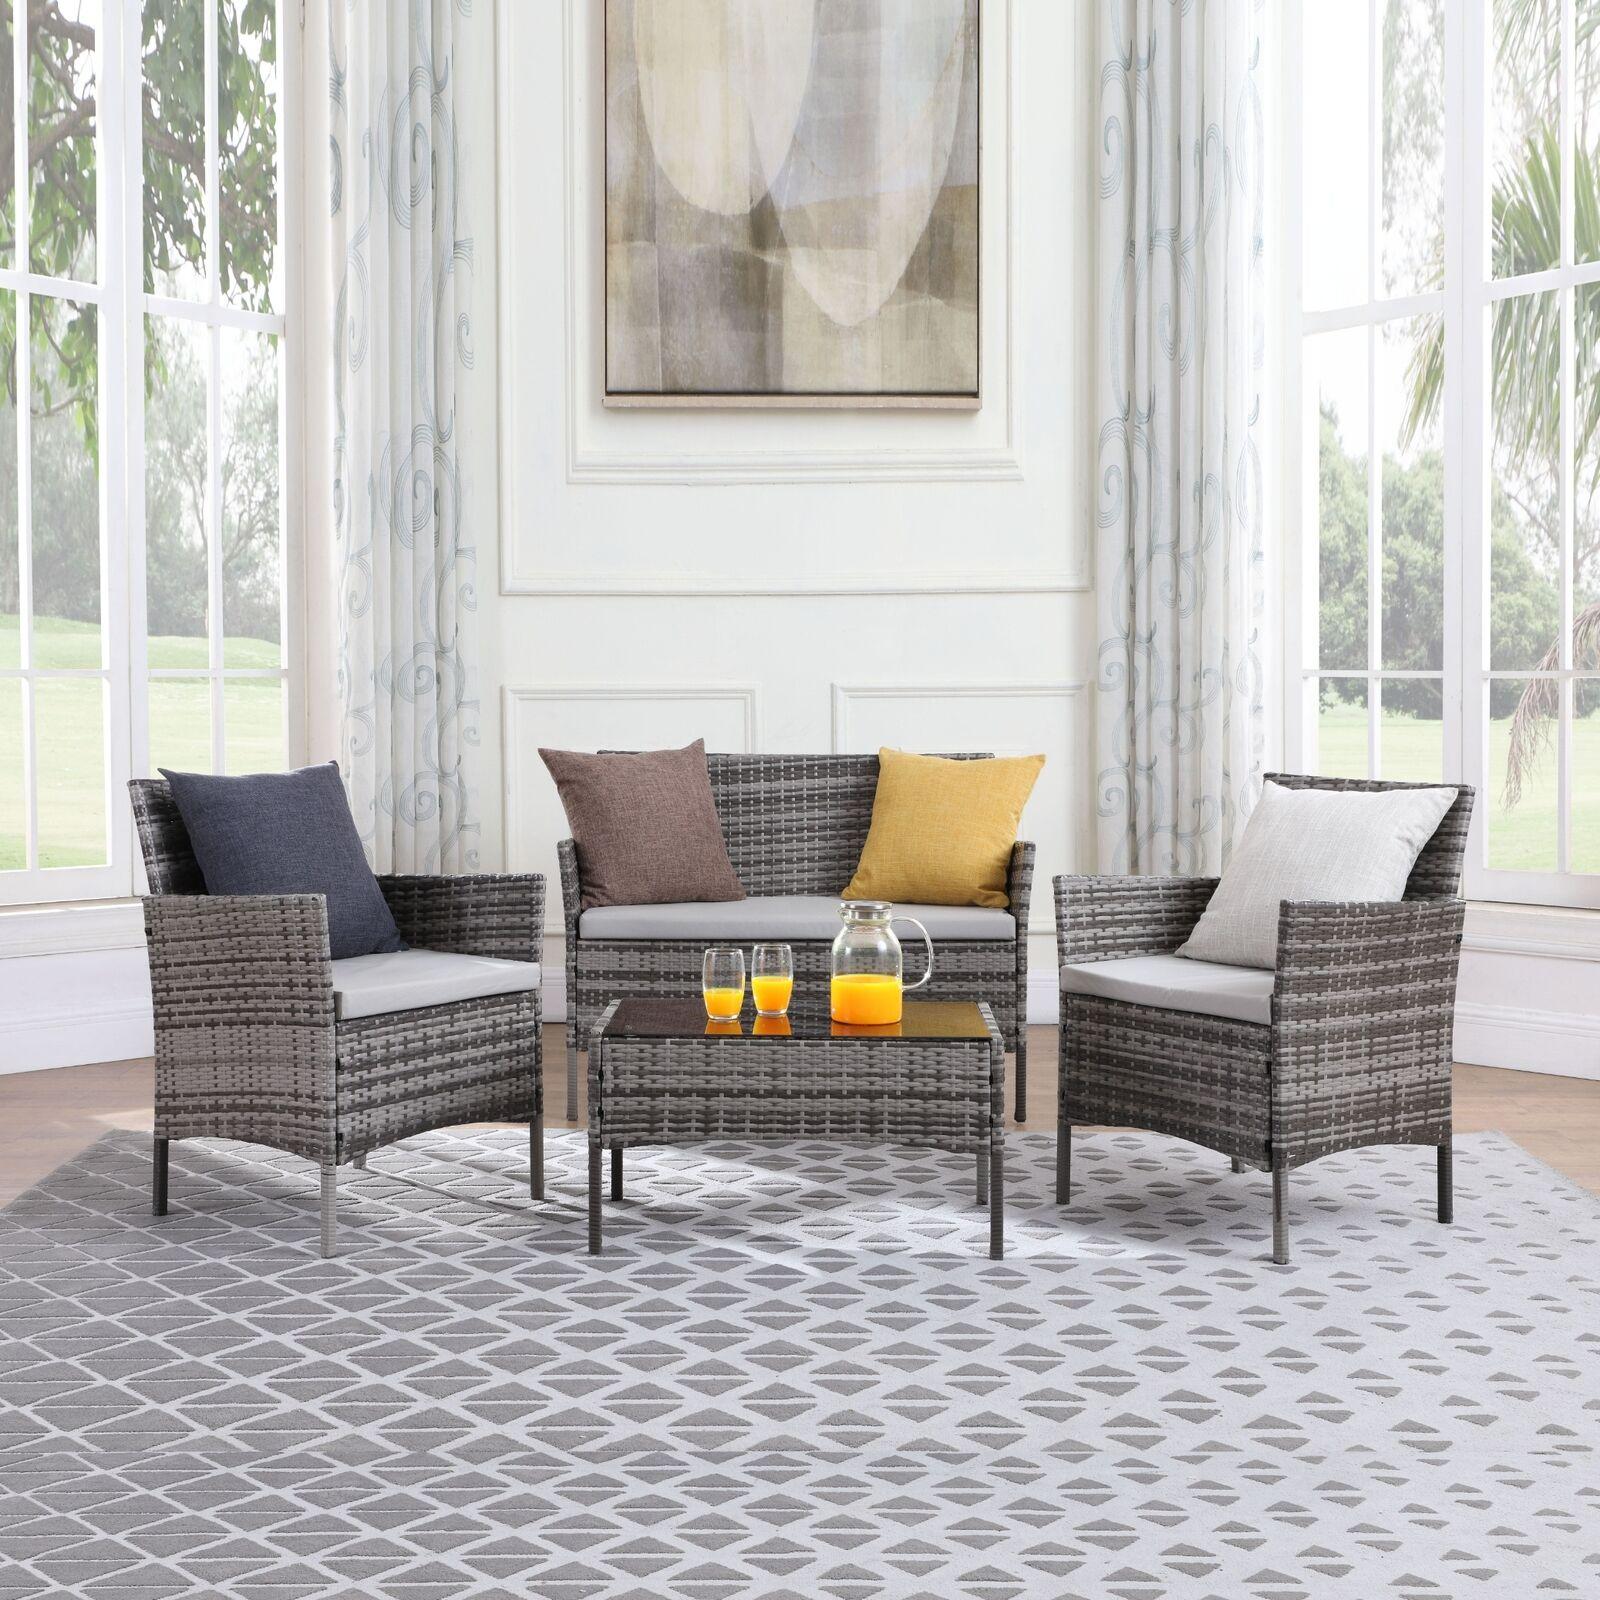 Garden Furniture - RATTAN GARDEN FURNITURE SET 4 PIECE SOFA CHAIRS TABLE OUTDOOR PATIO CONSERVATORY